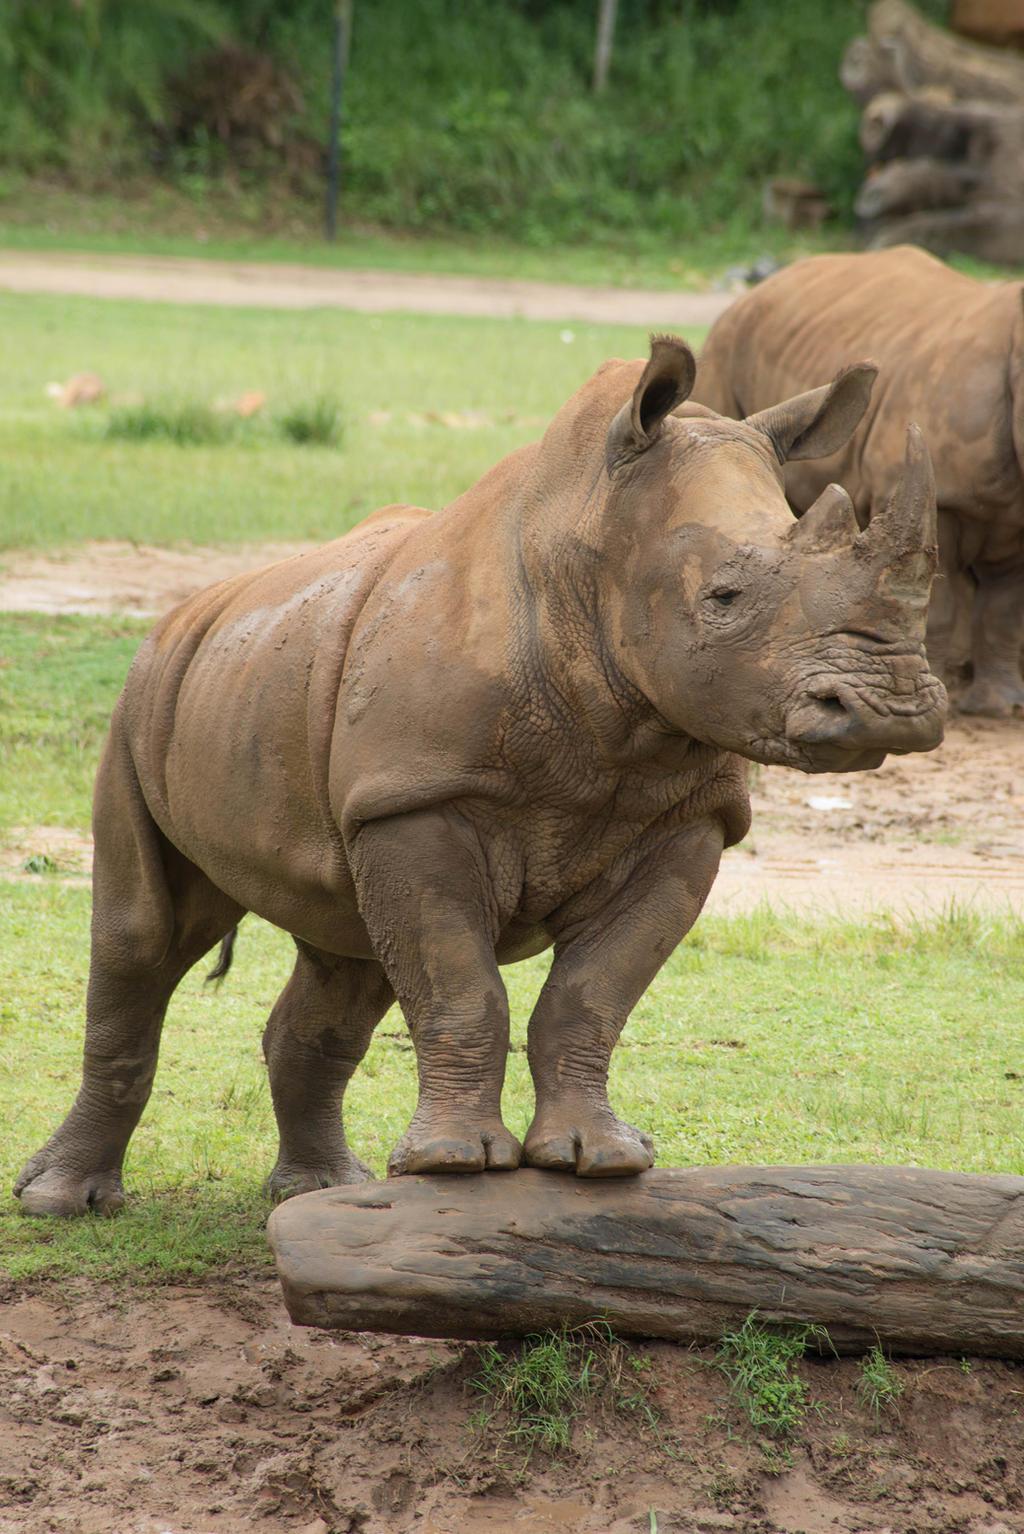 Australia Zoo - Rhinoceros